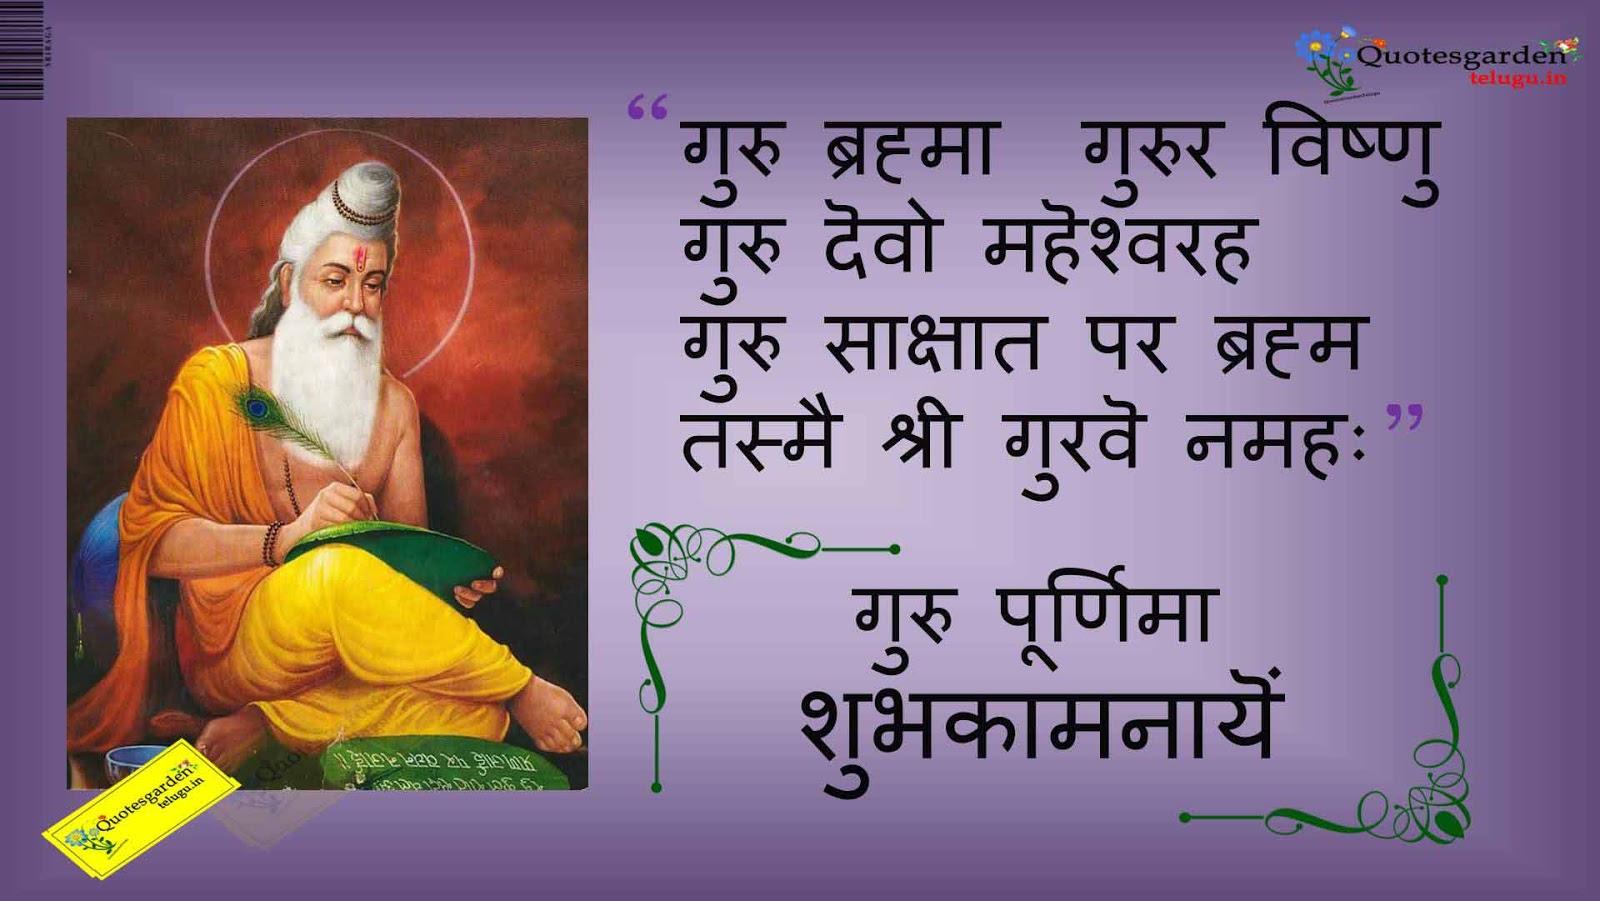 Guru Purnima Wishes Quotes In Hindi Marathi: Guru Purnima Quotes Shloka Greetings Wallpapers Images In